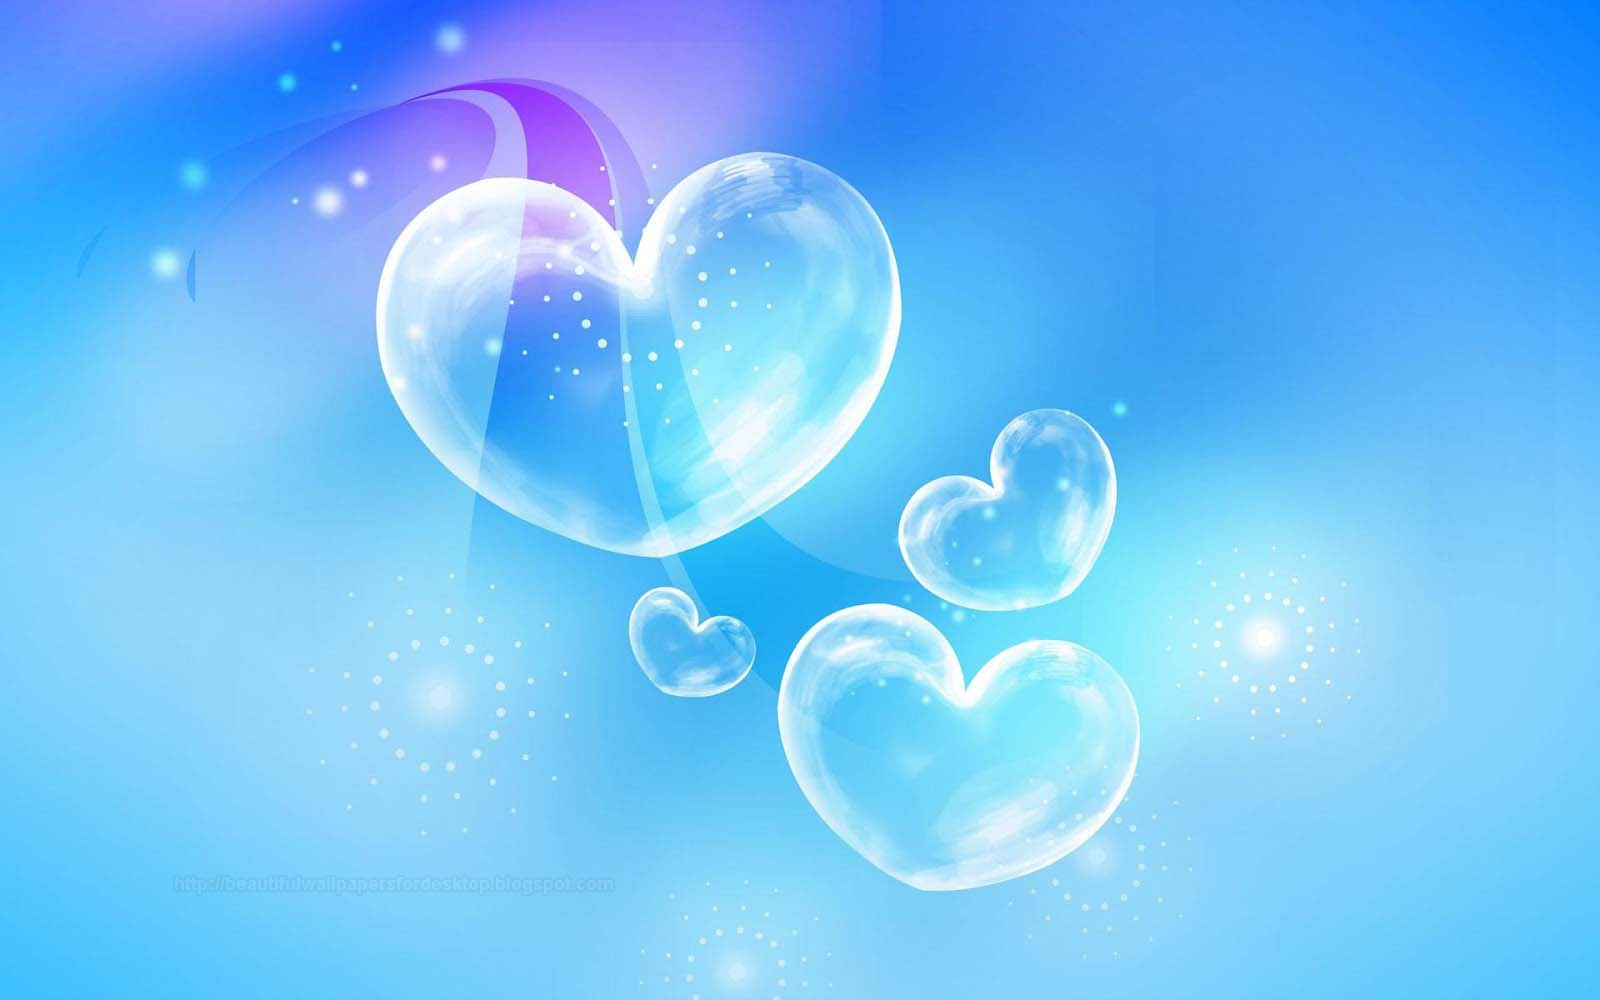 Love hd wallpapers - Image of love wallpaper hd ...